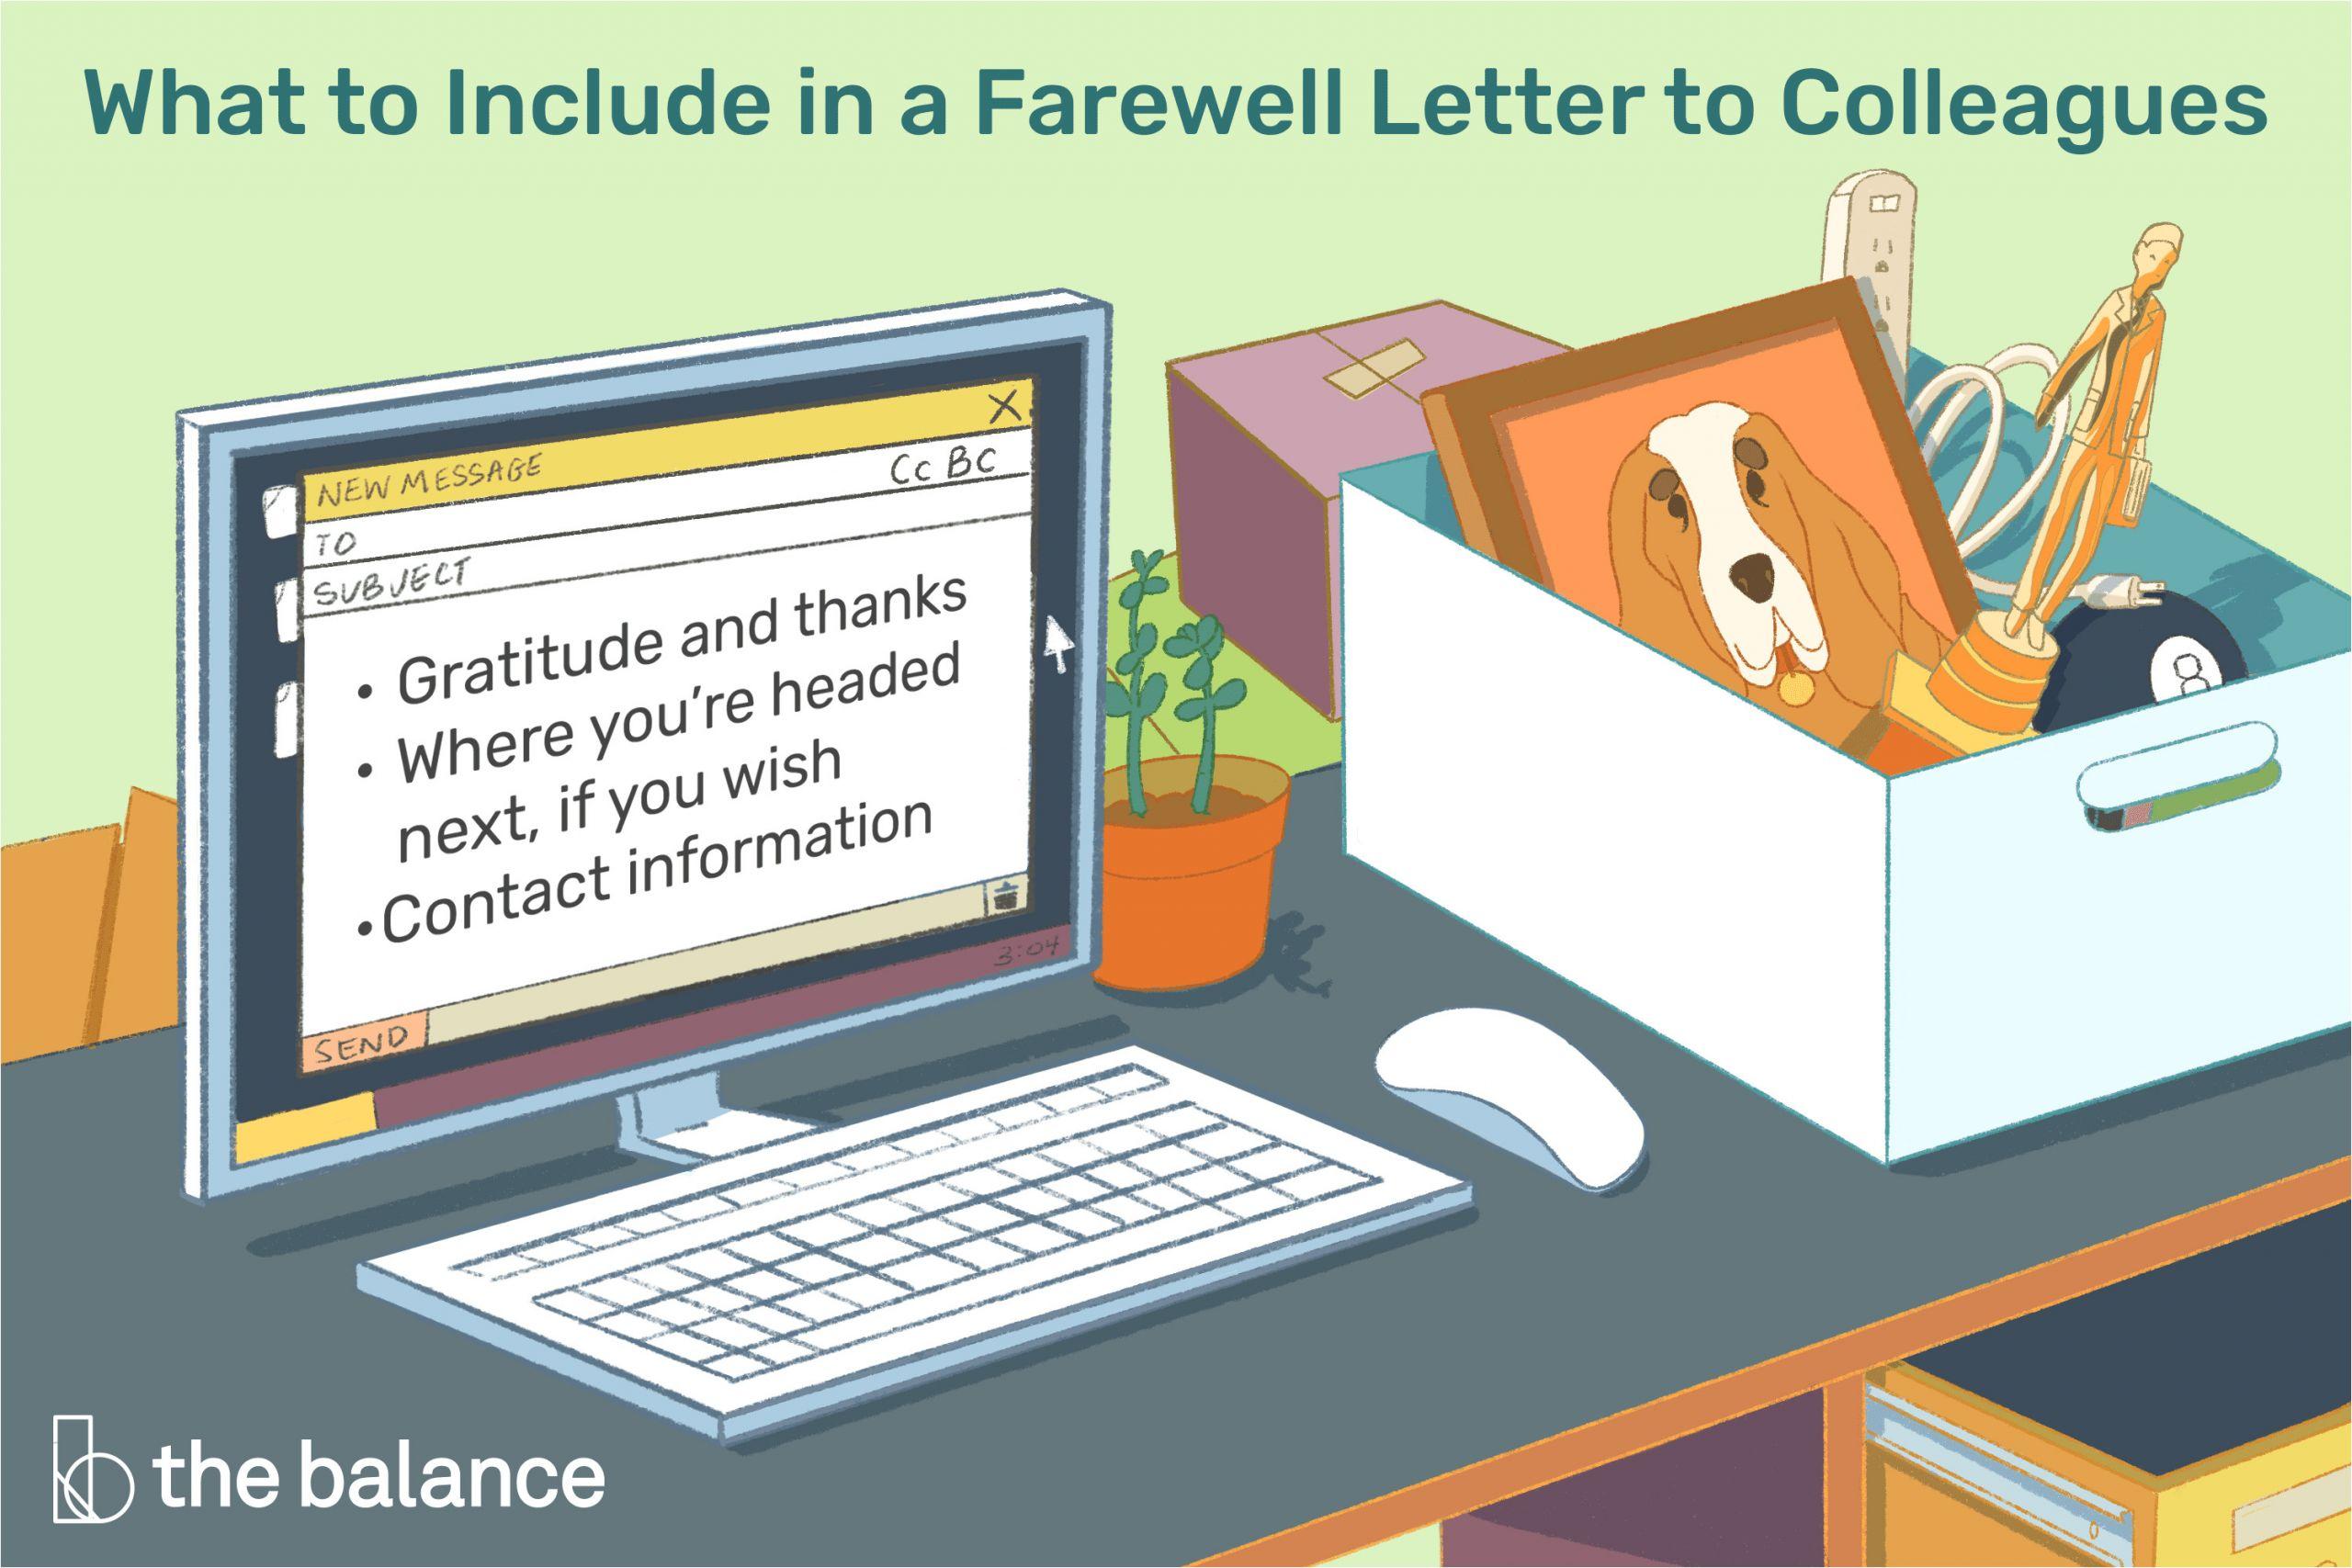 farewell letter samples 2060863 final 1d4e1ed4b2754b2891177e5b7b1f4d00 png